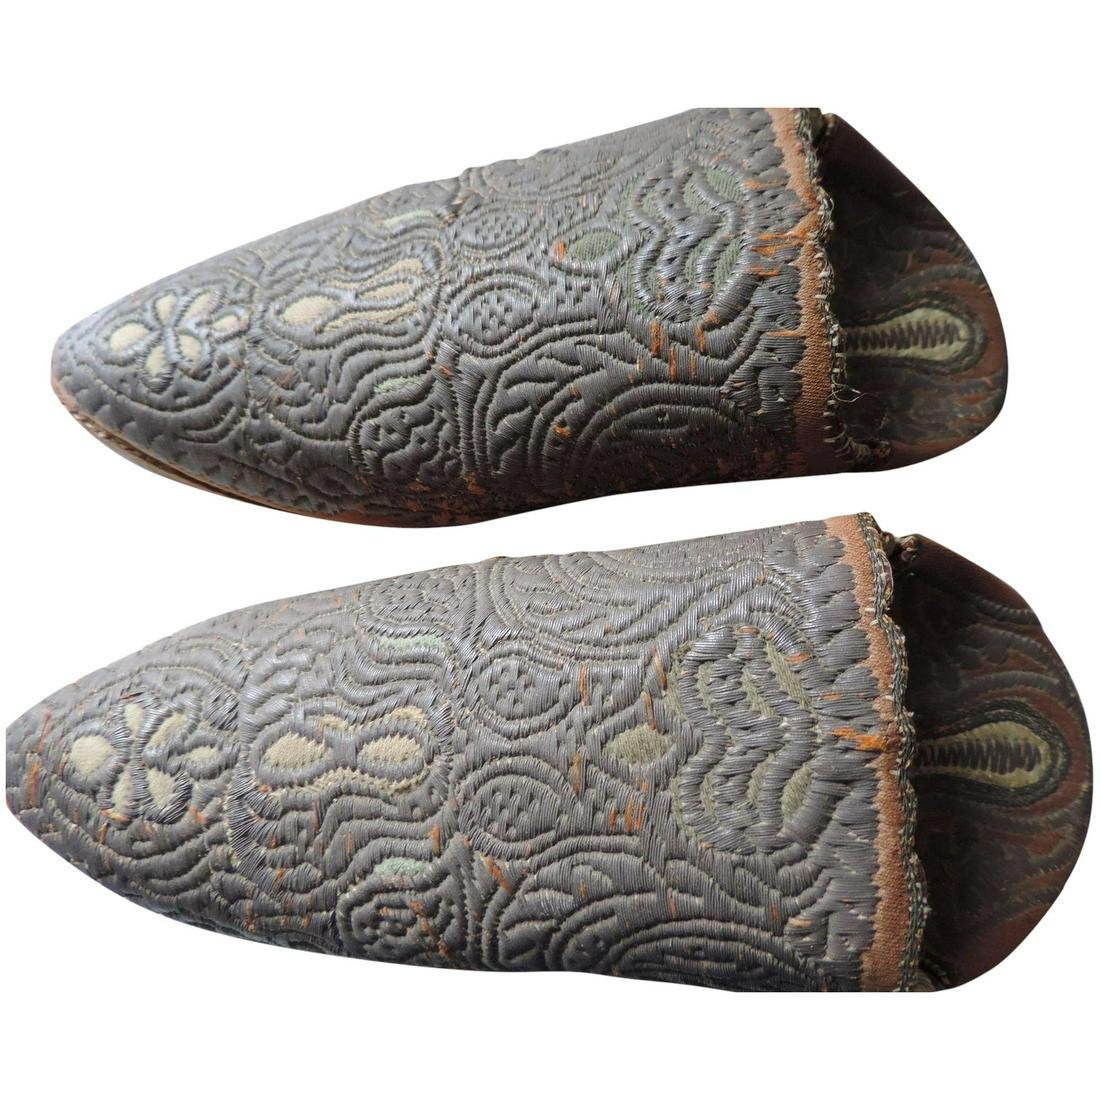 Ottoman Empire Shoes, Leather Soles, Bronze Bullion